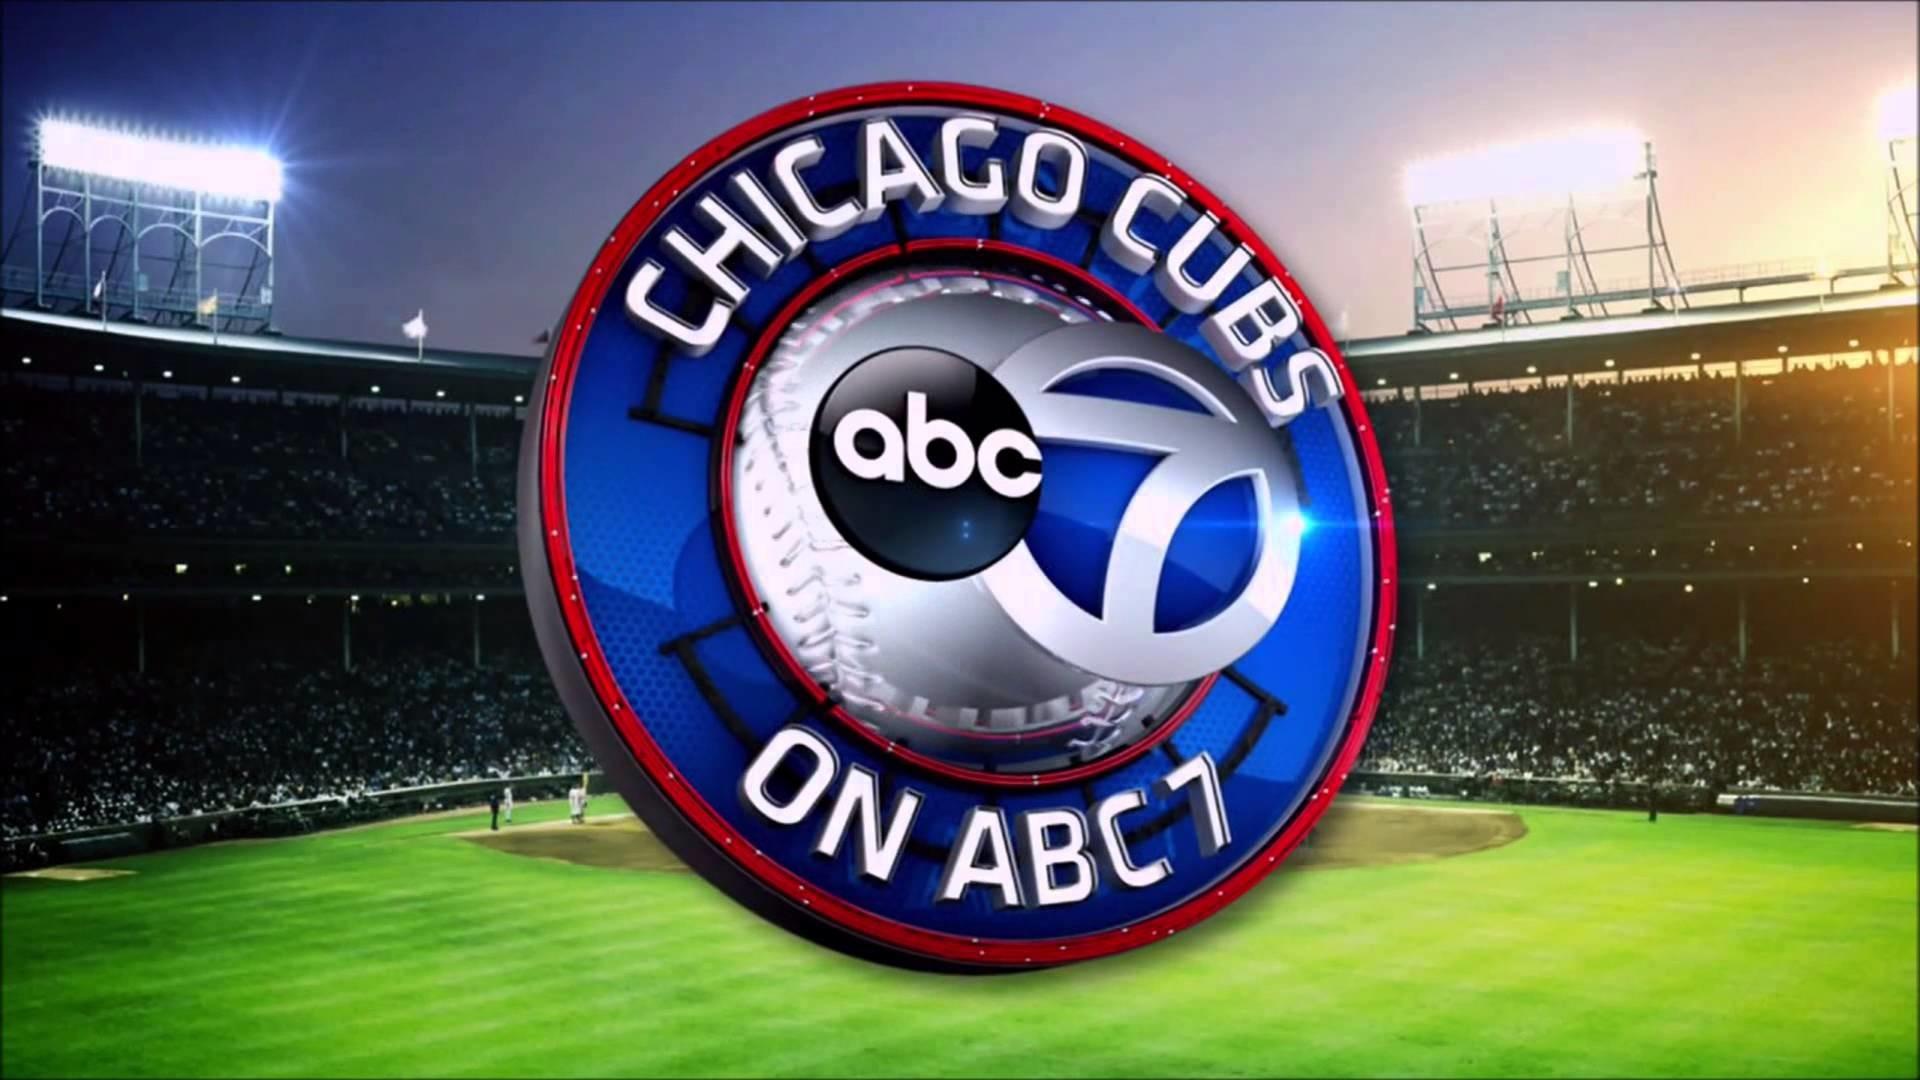 Filename: Chicago-Cubs-Wallpaper-HD-For-Desktop.jpg